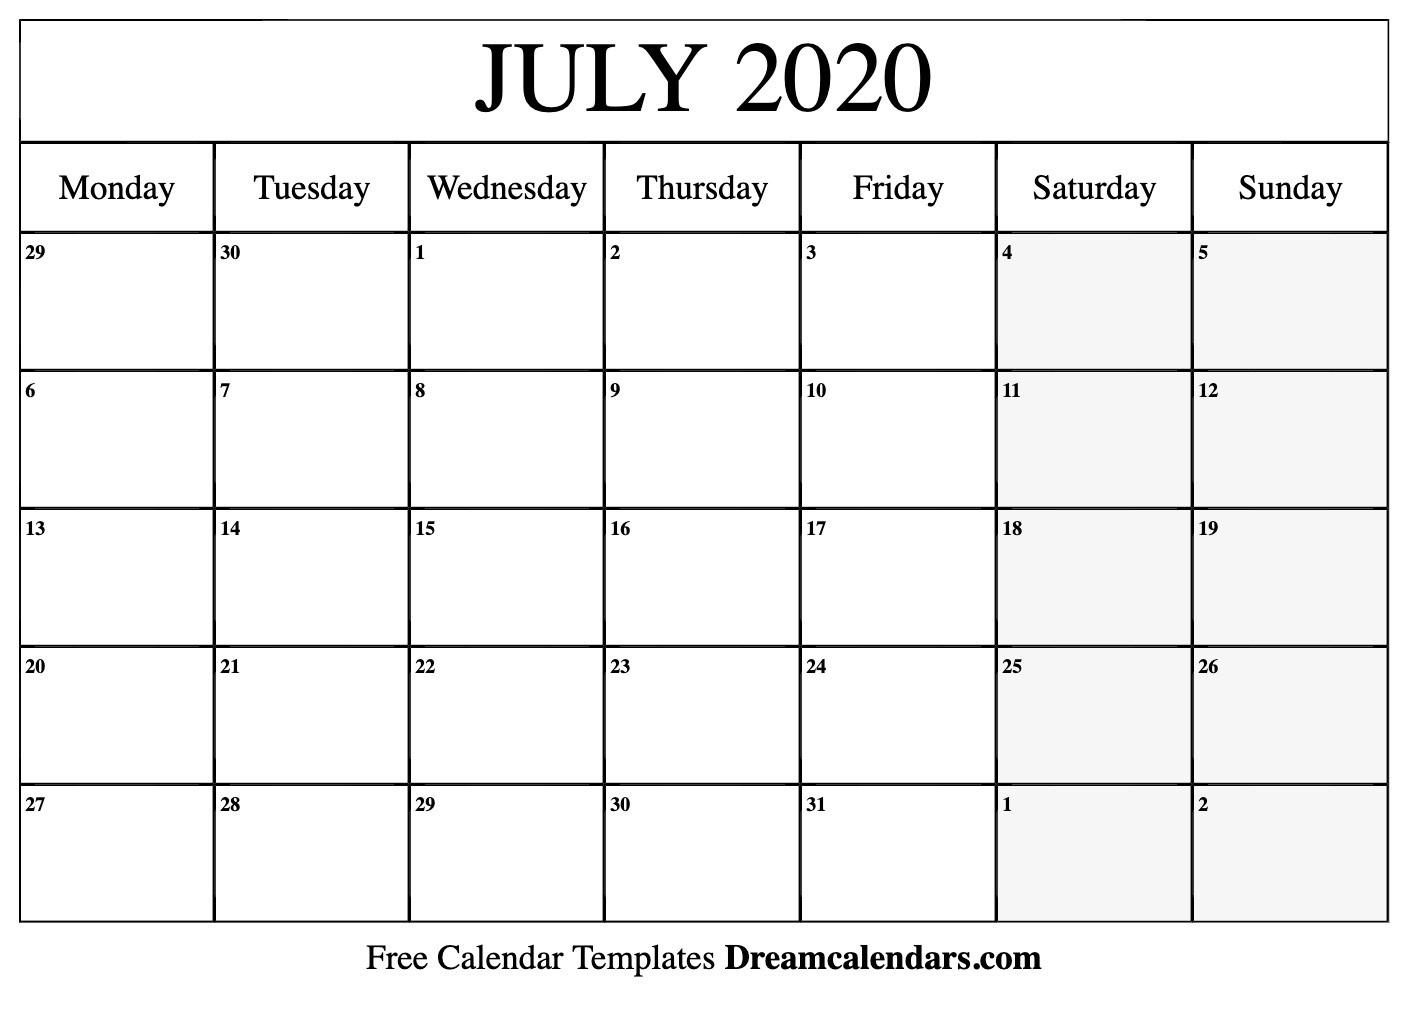 Printable July 2020 Calendar-Printable Blank 2020 Calendar For June July And August